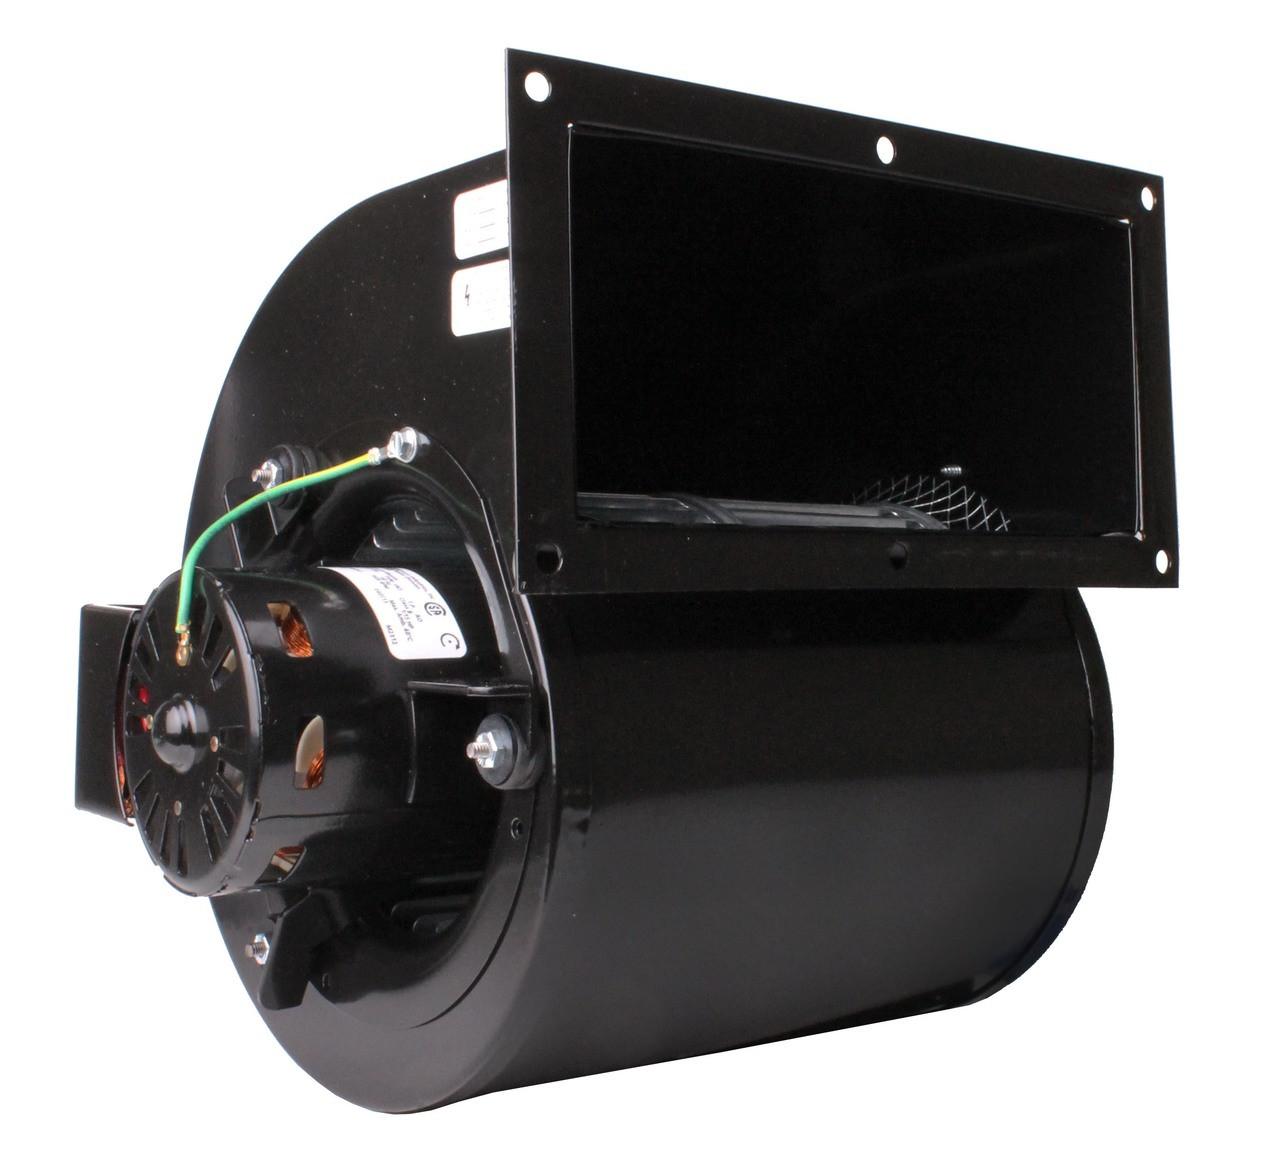 Centrifugal Blower 115 Volts 2 Speed Fasco B45267 Ao Smith Spa Pump Wiring Diagram 115v